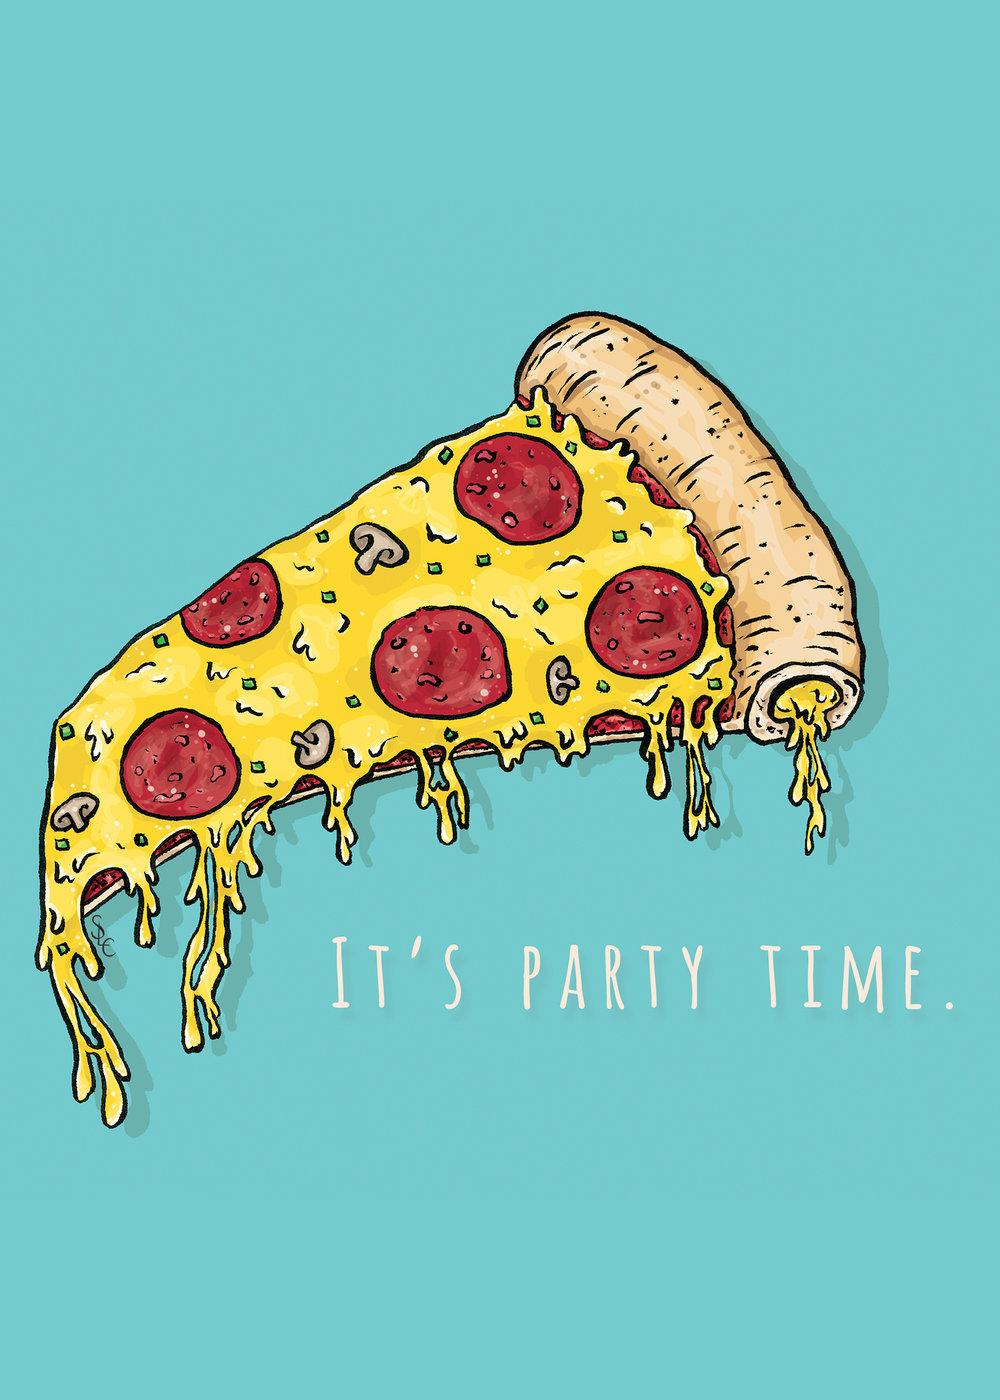 pizza party blue sm.jpg